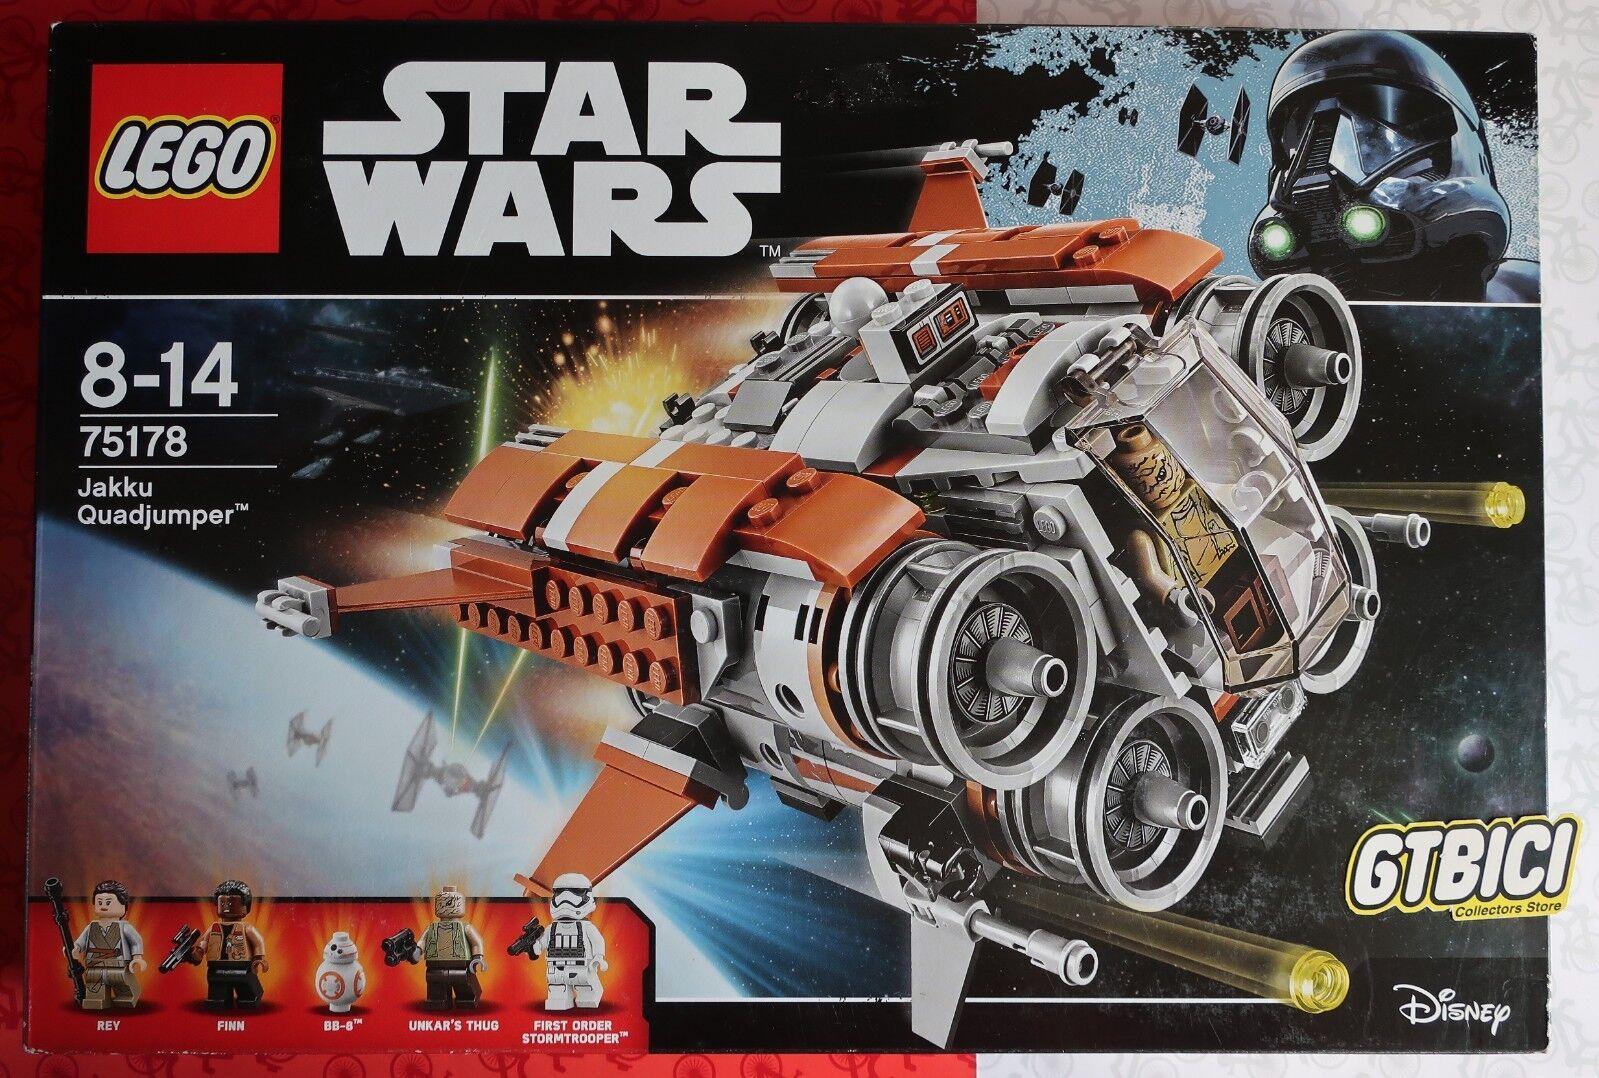 LEGO STAR WARS  `` JAKKU QUADJUMPER ´´  Ref Ref Ref 75178  NUEVO A ESTRENAR afceab